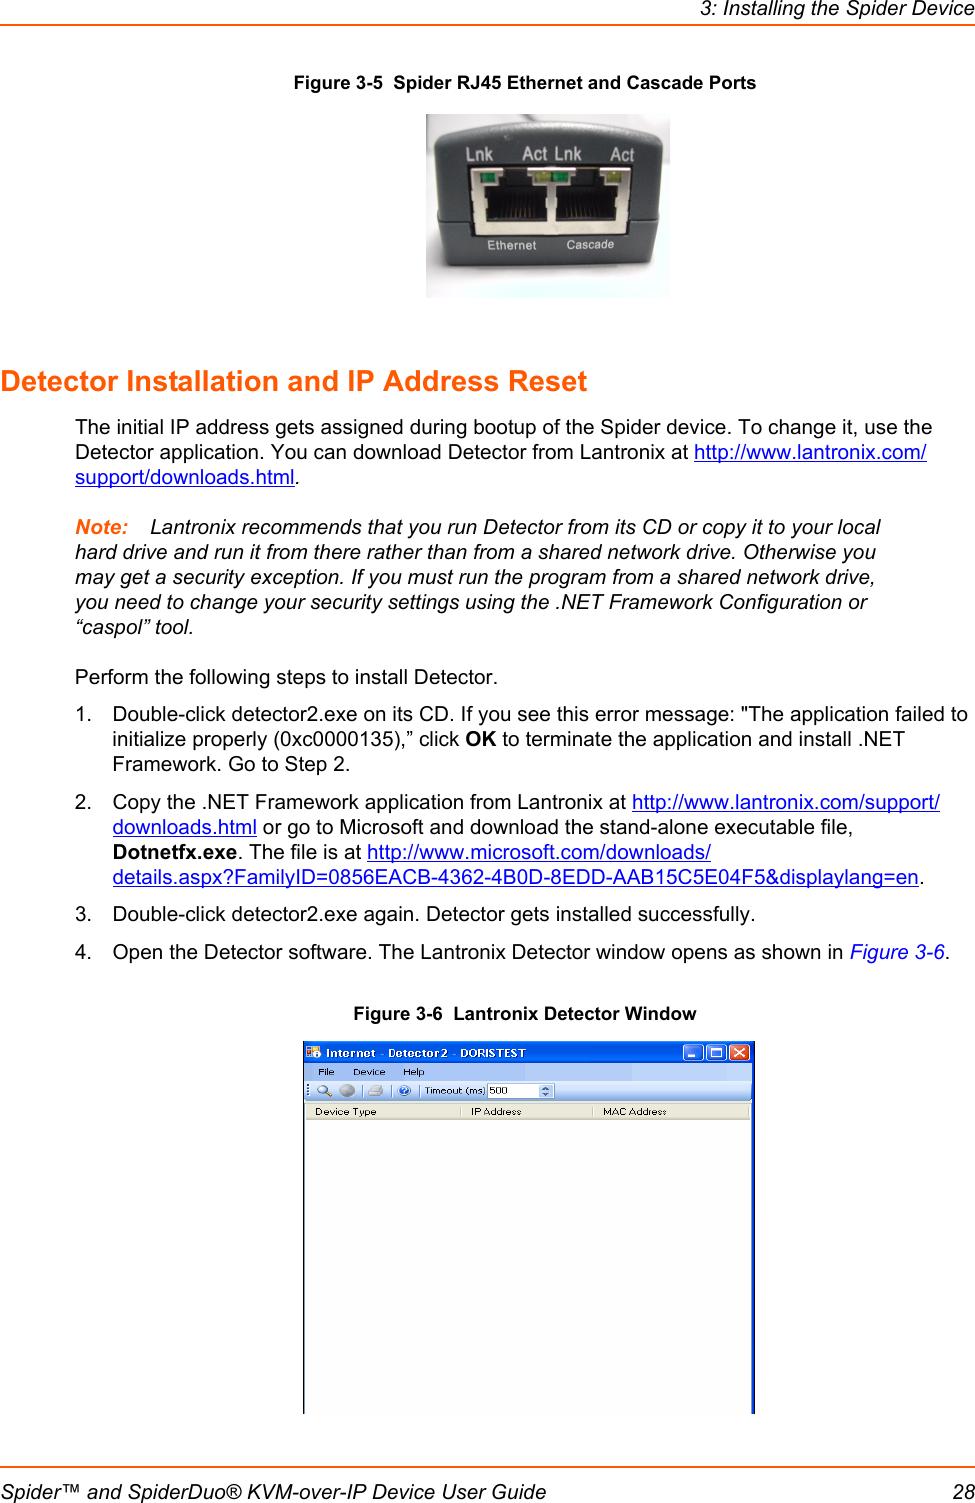 Lantronix Securelinx Spiderduo Kvm Switch Slslp400Ps201 Users Manual